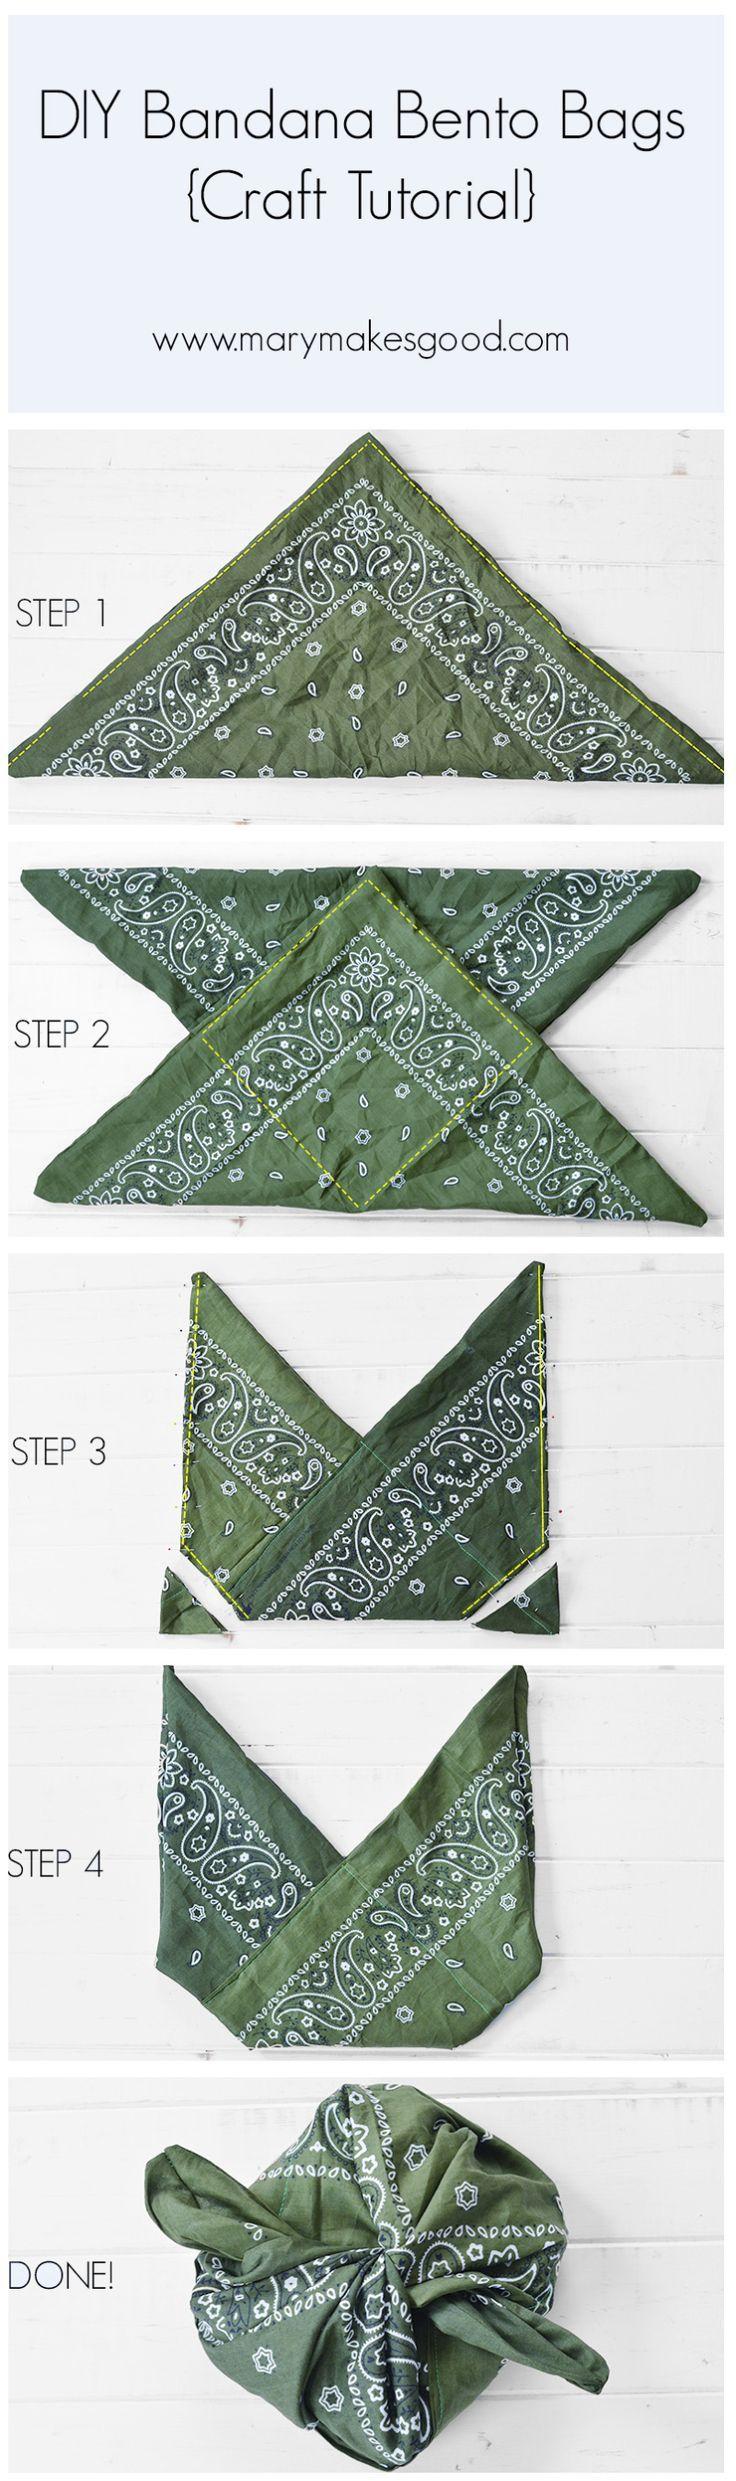 DIY Bandana Bento Bags {Craft Tutorial} » Mary Makes Good